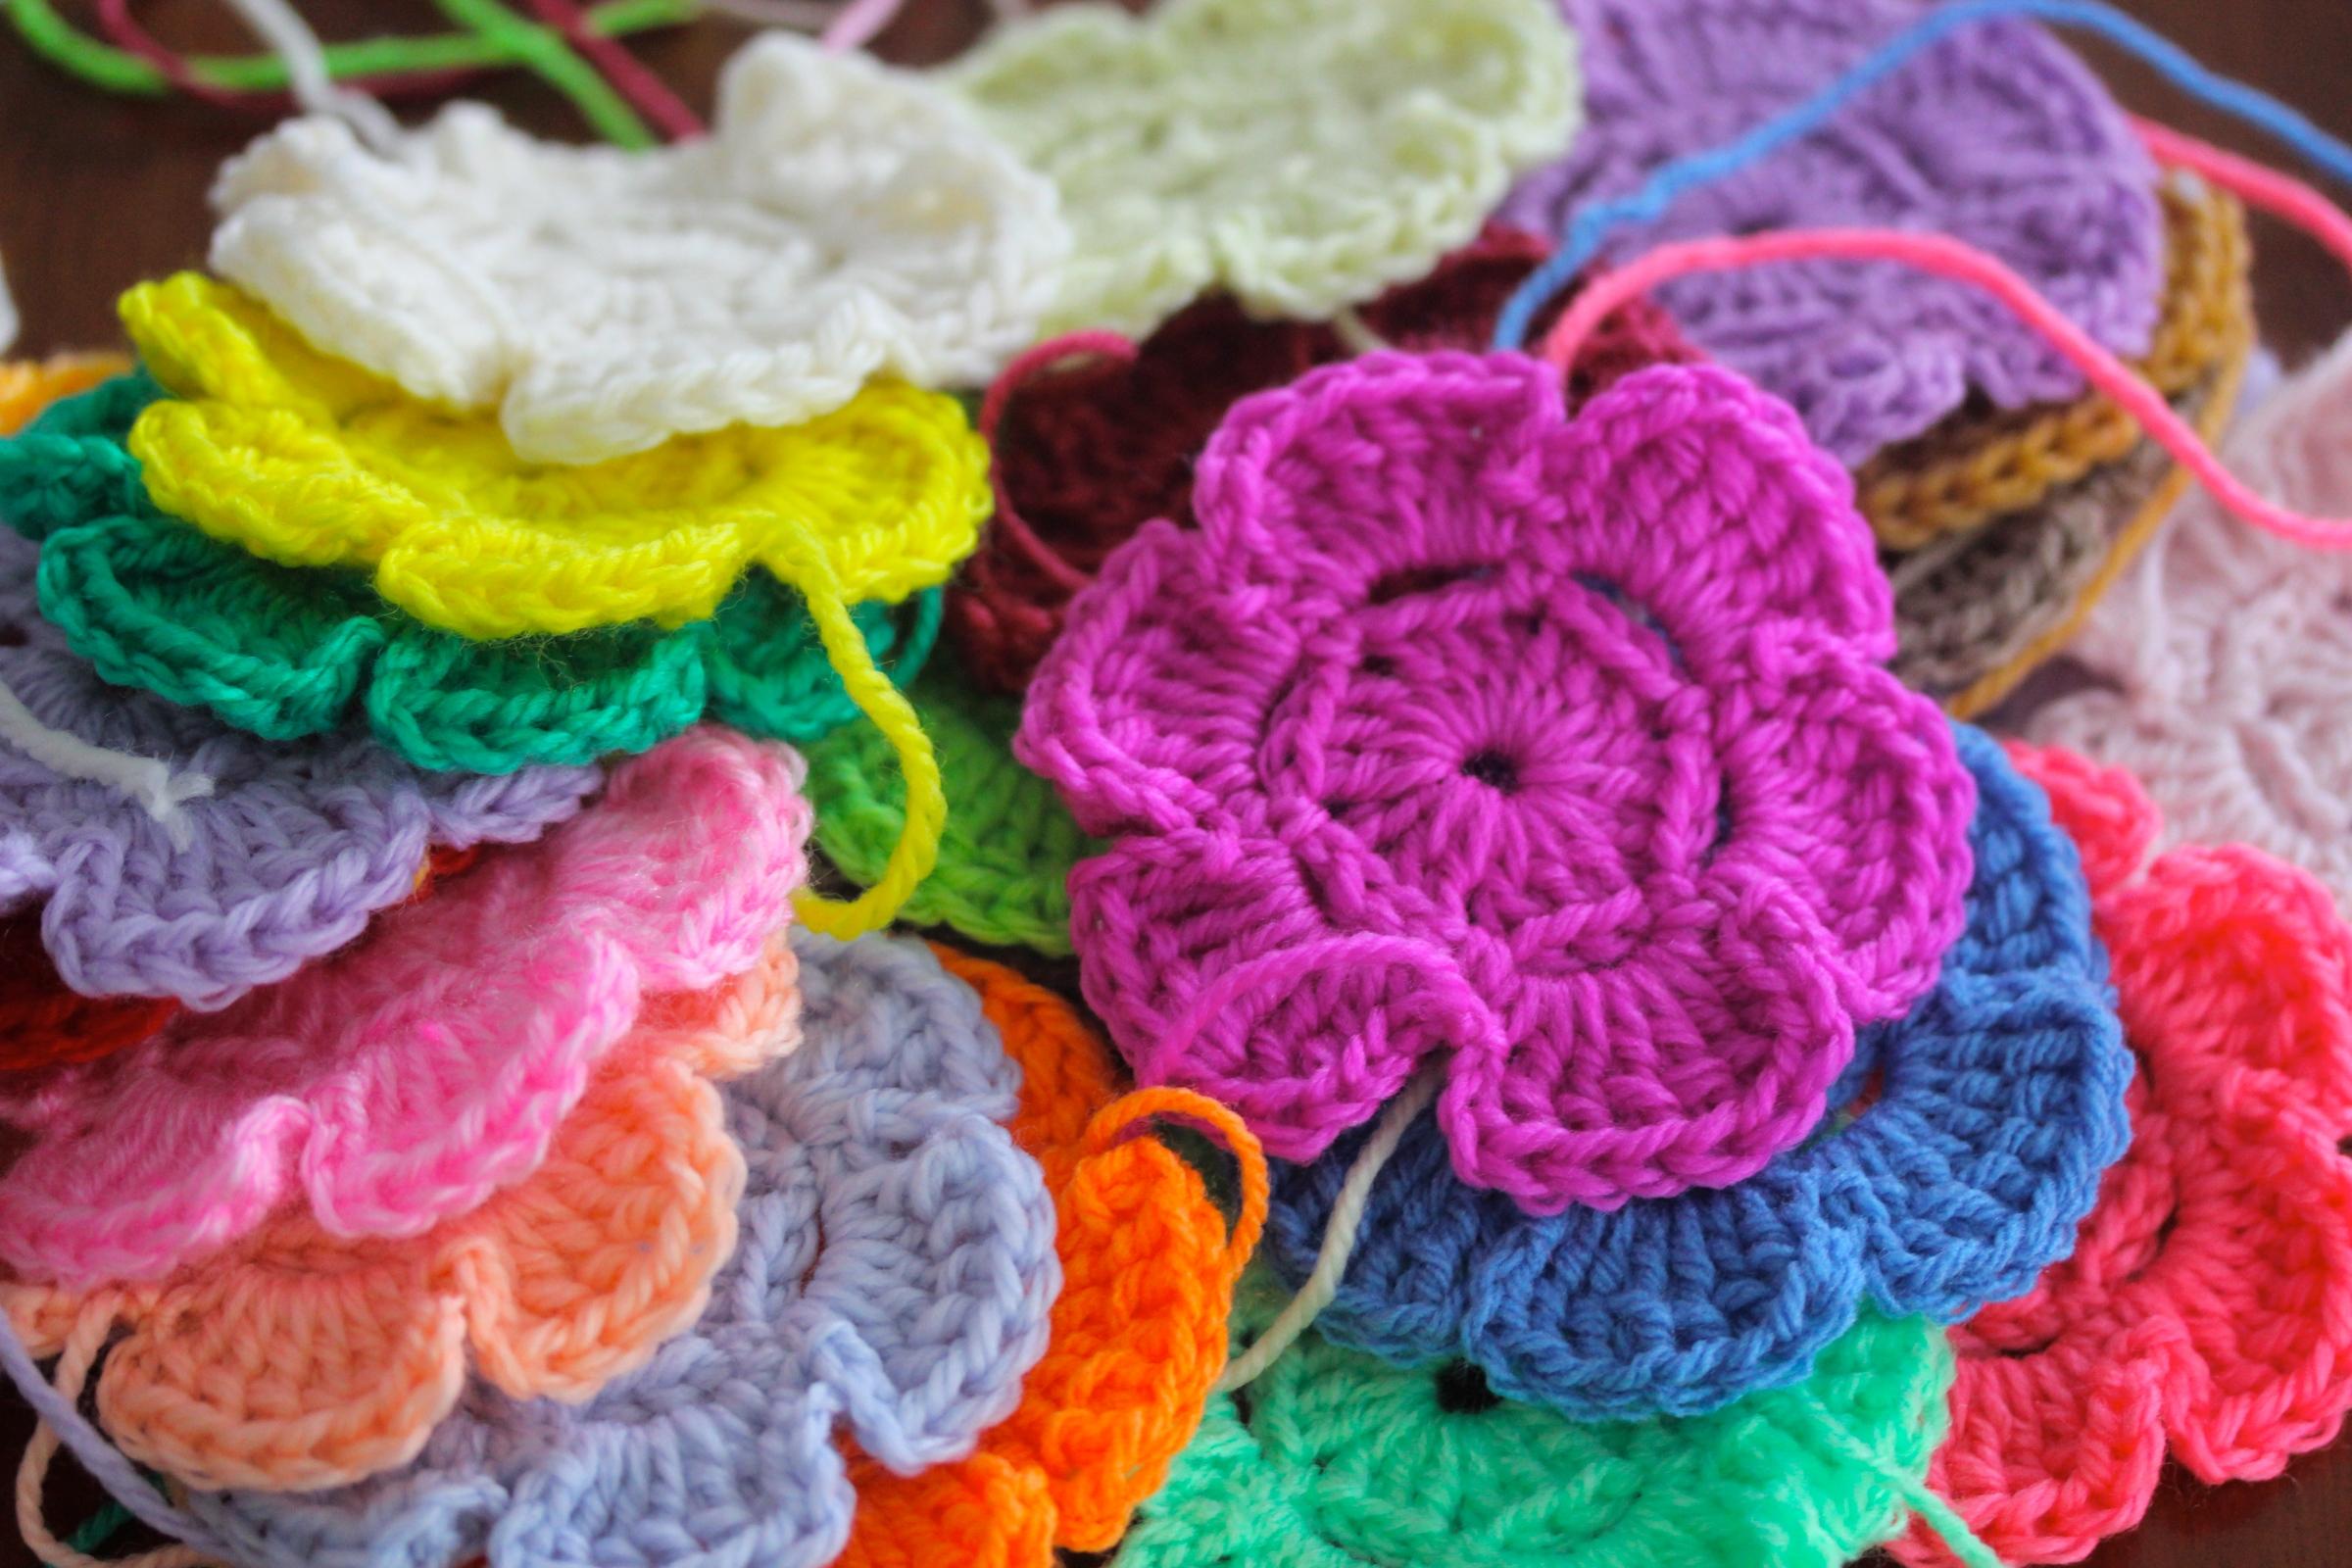 Field of Flower Cushion | Sarah London